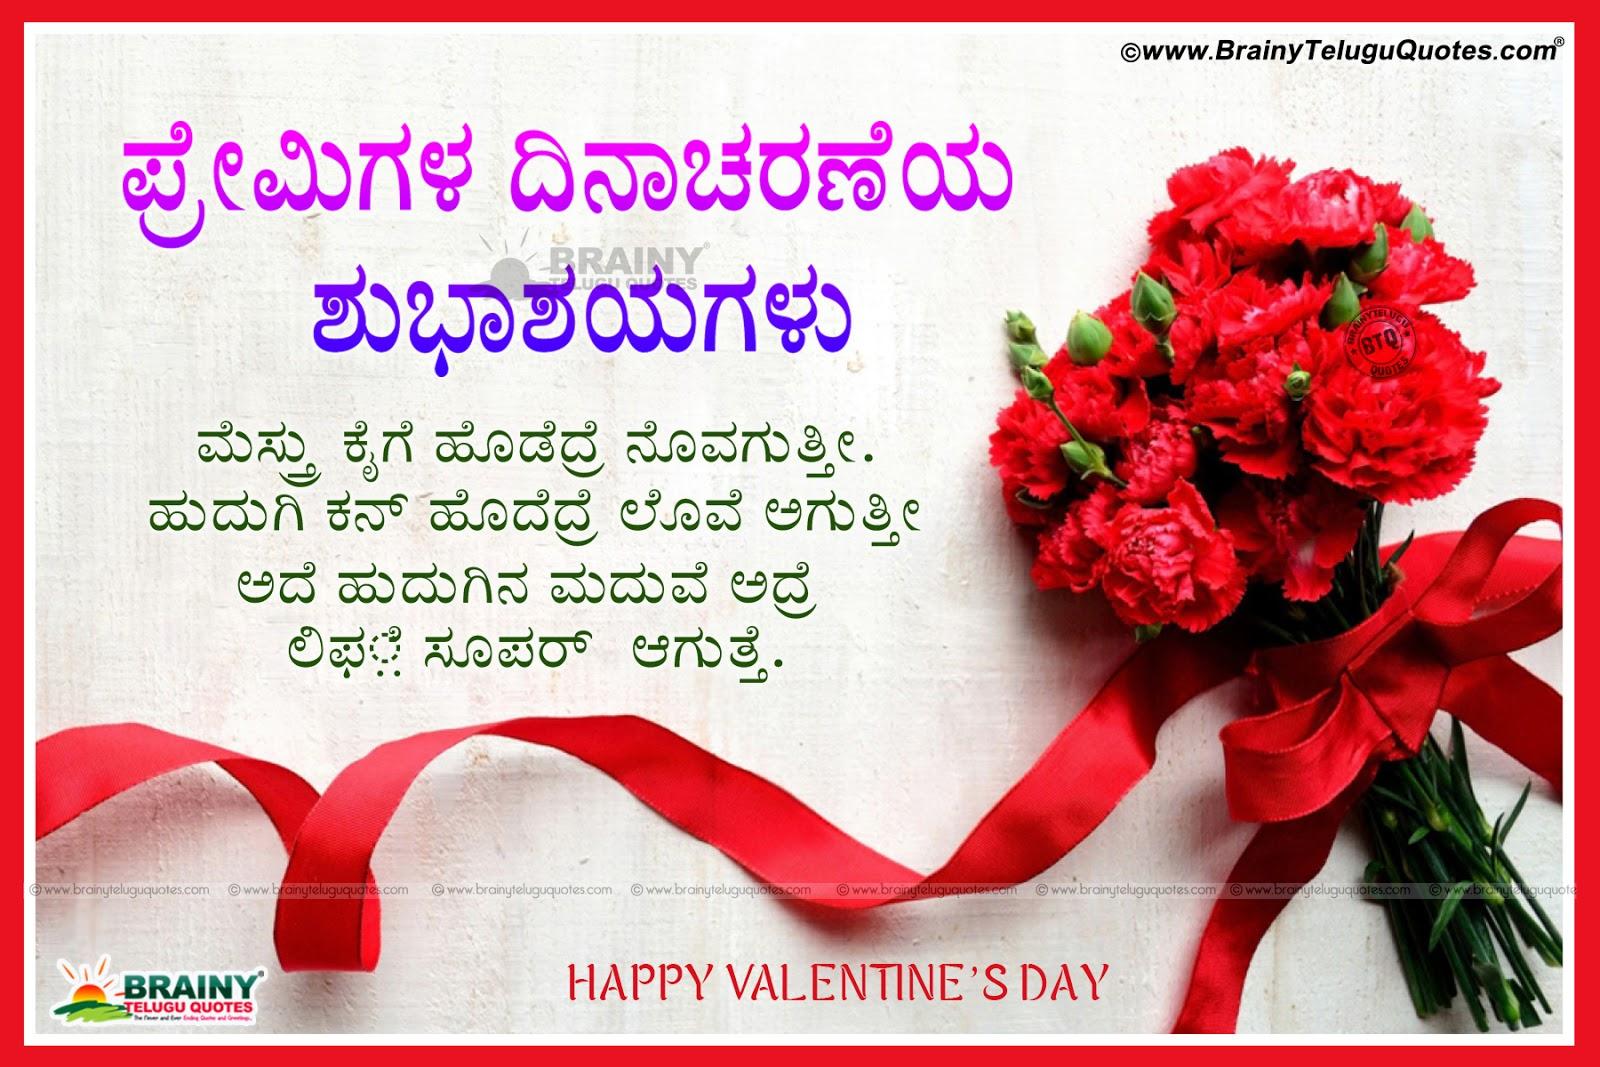 Valentines Day Telugu Hd Quotes Greetings Hd Fondos De Pantalla